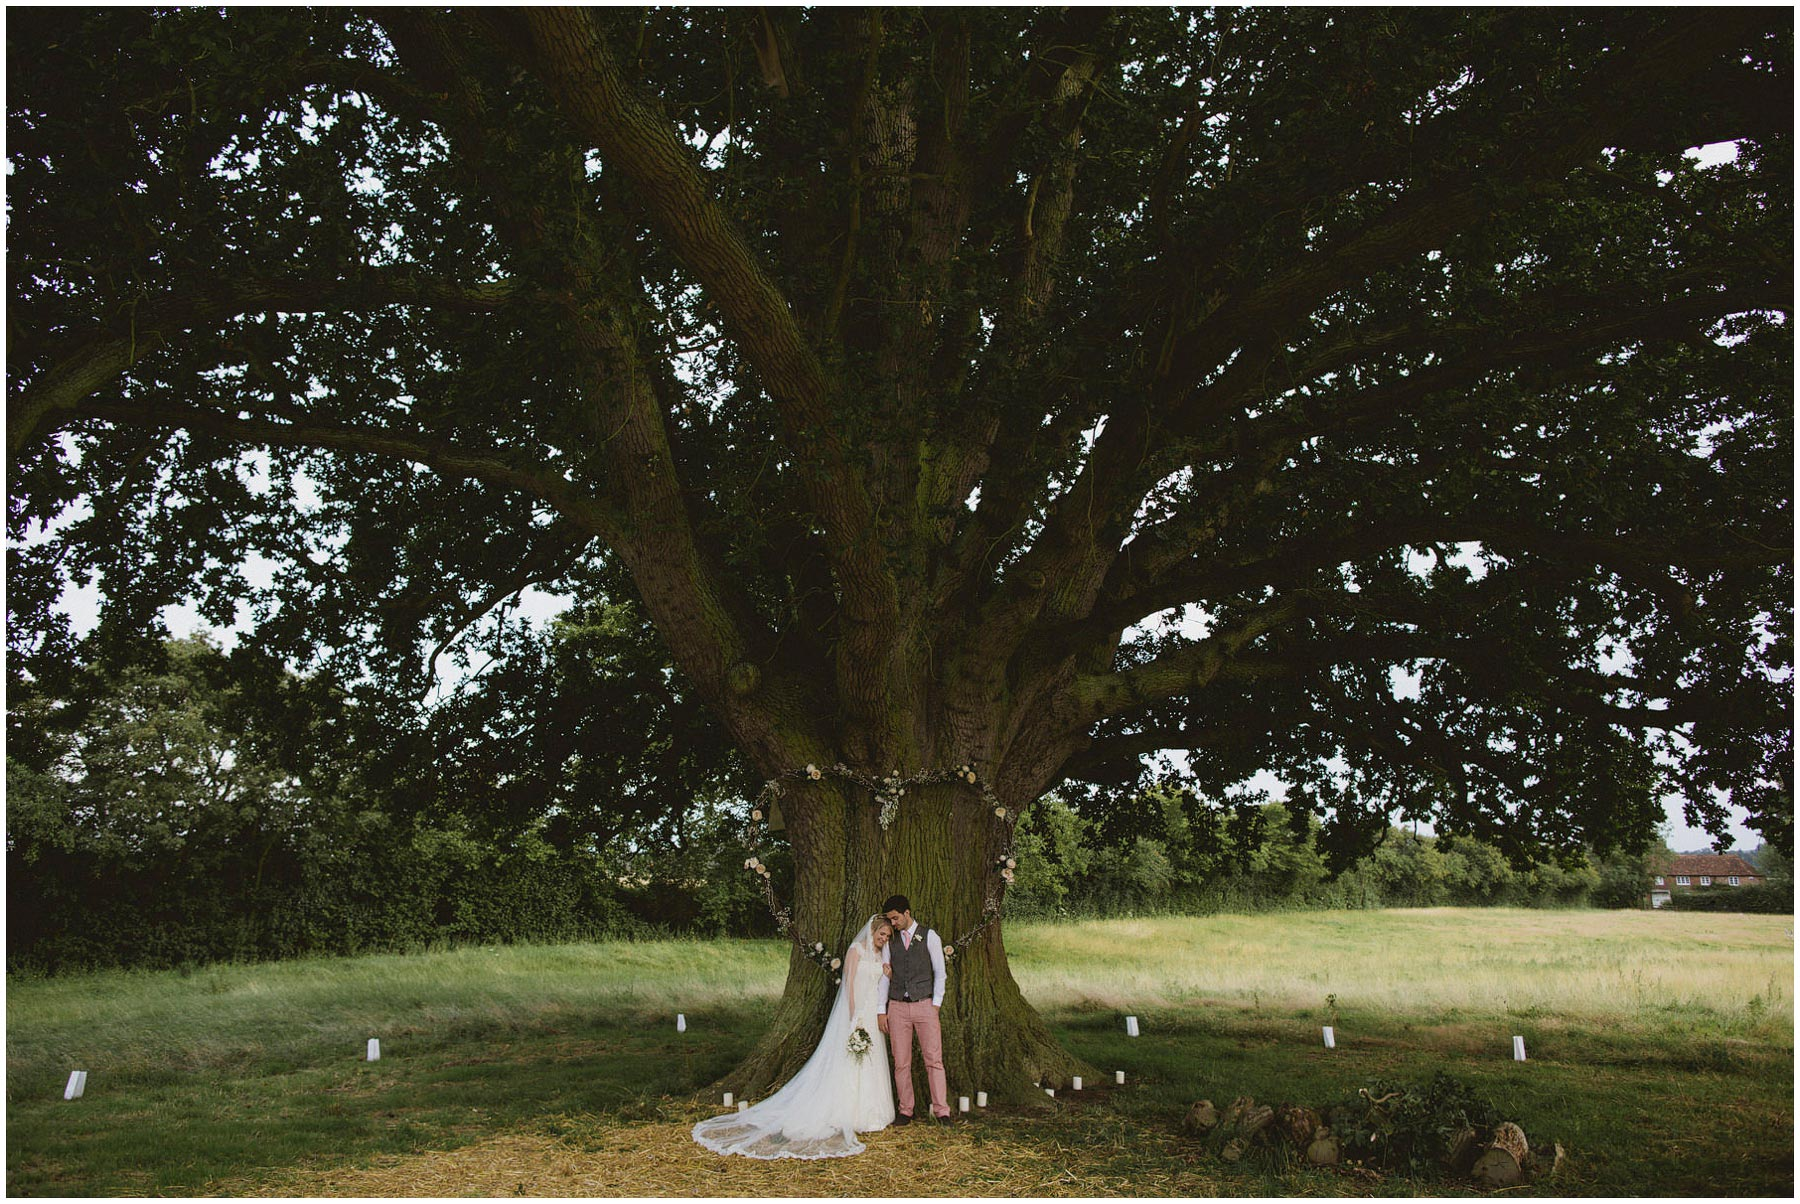 Kent-Festival-Tipi-wedding-photography_0141